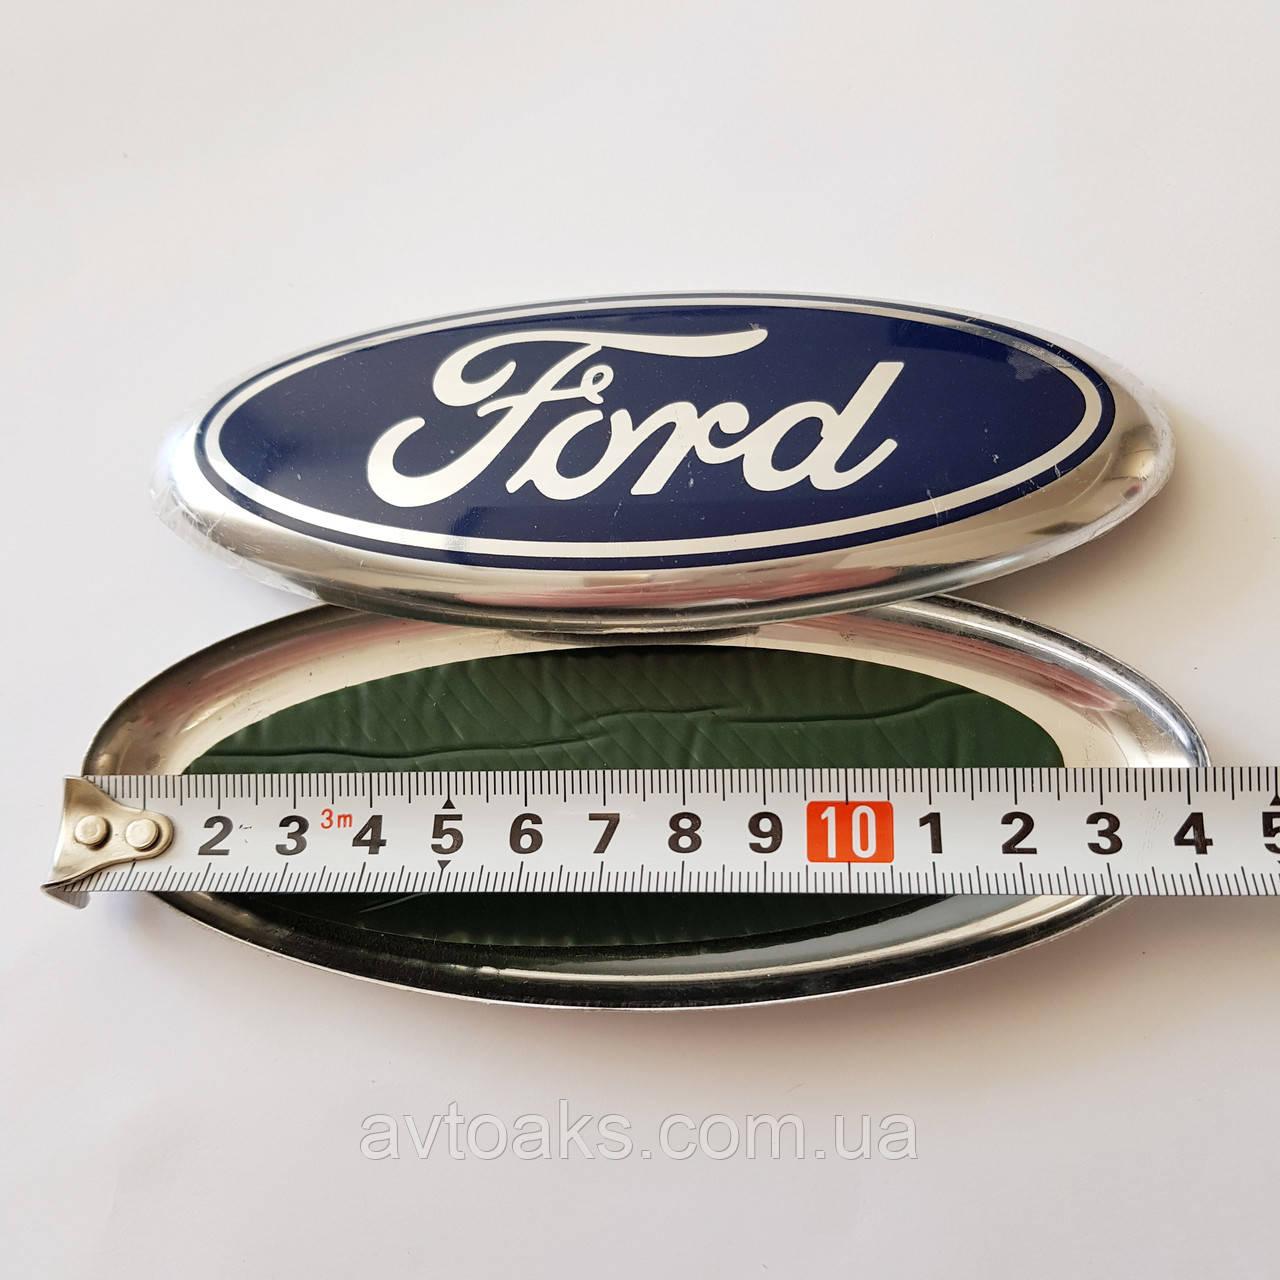 Эмблема накладка Ford, 144х58 мм.